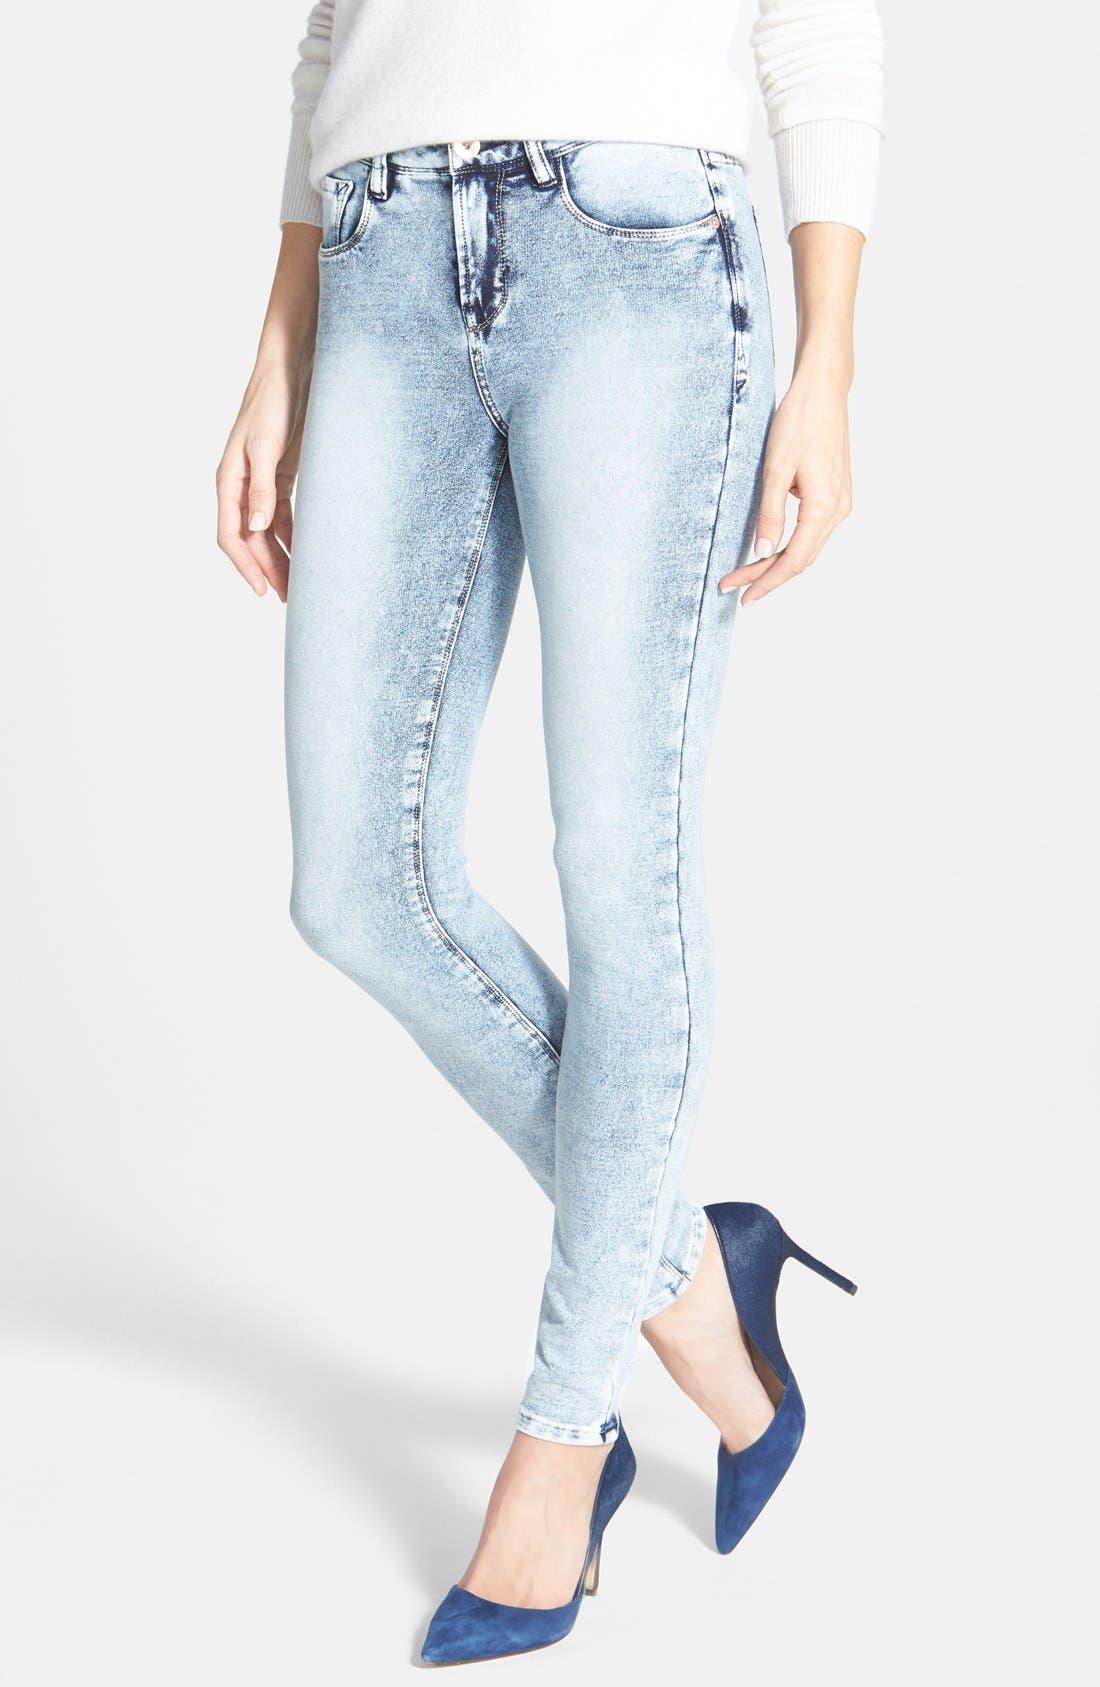 Main Image - kensie 'Ankle Biter' Acid Wash French Terry Skinny Jeans (Grey Acid)